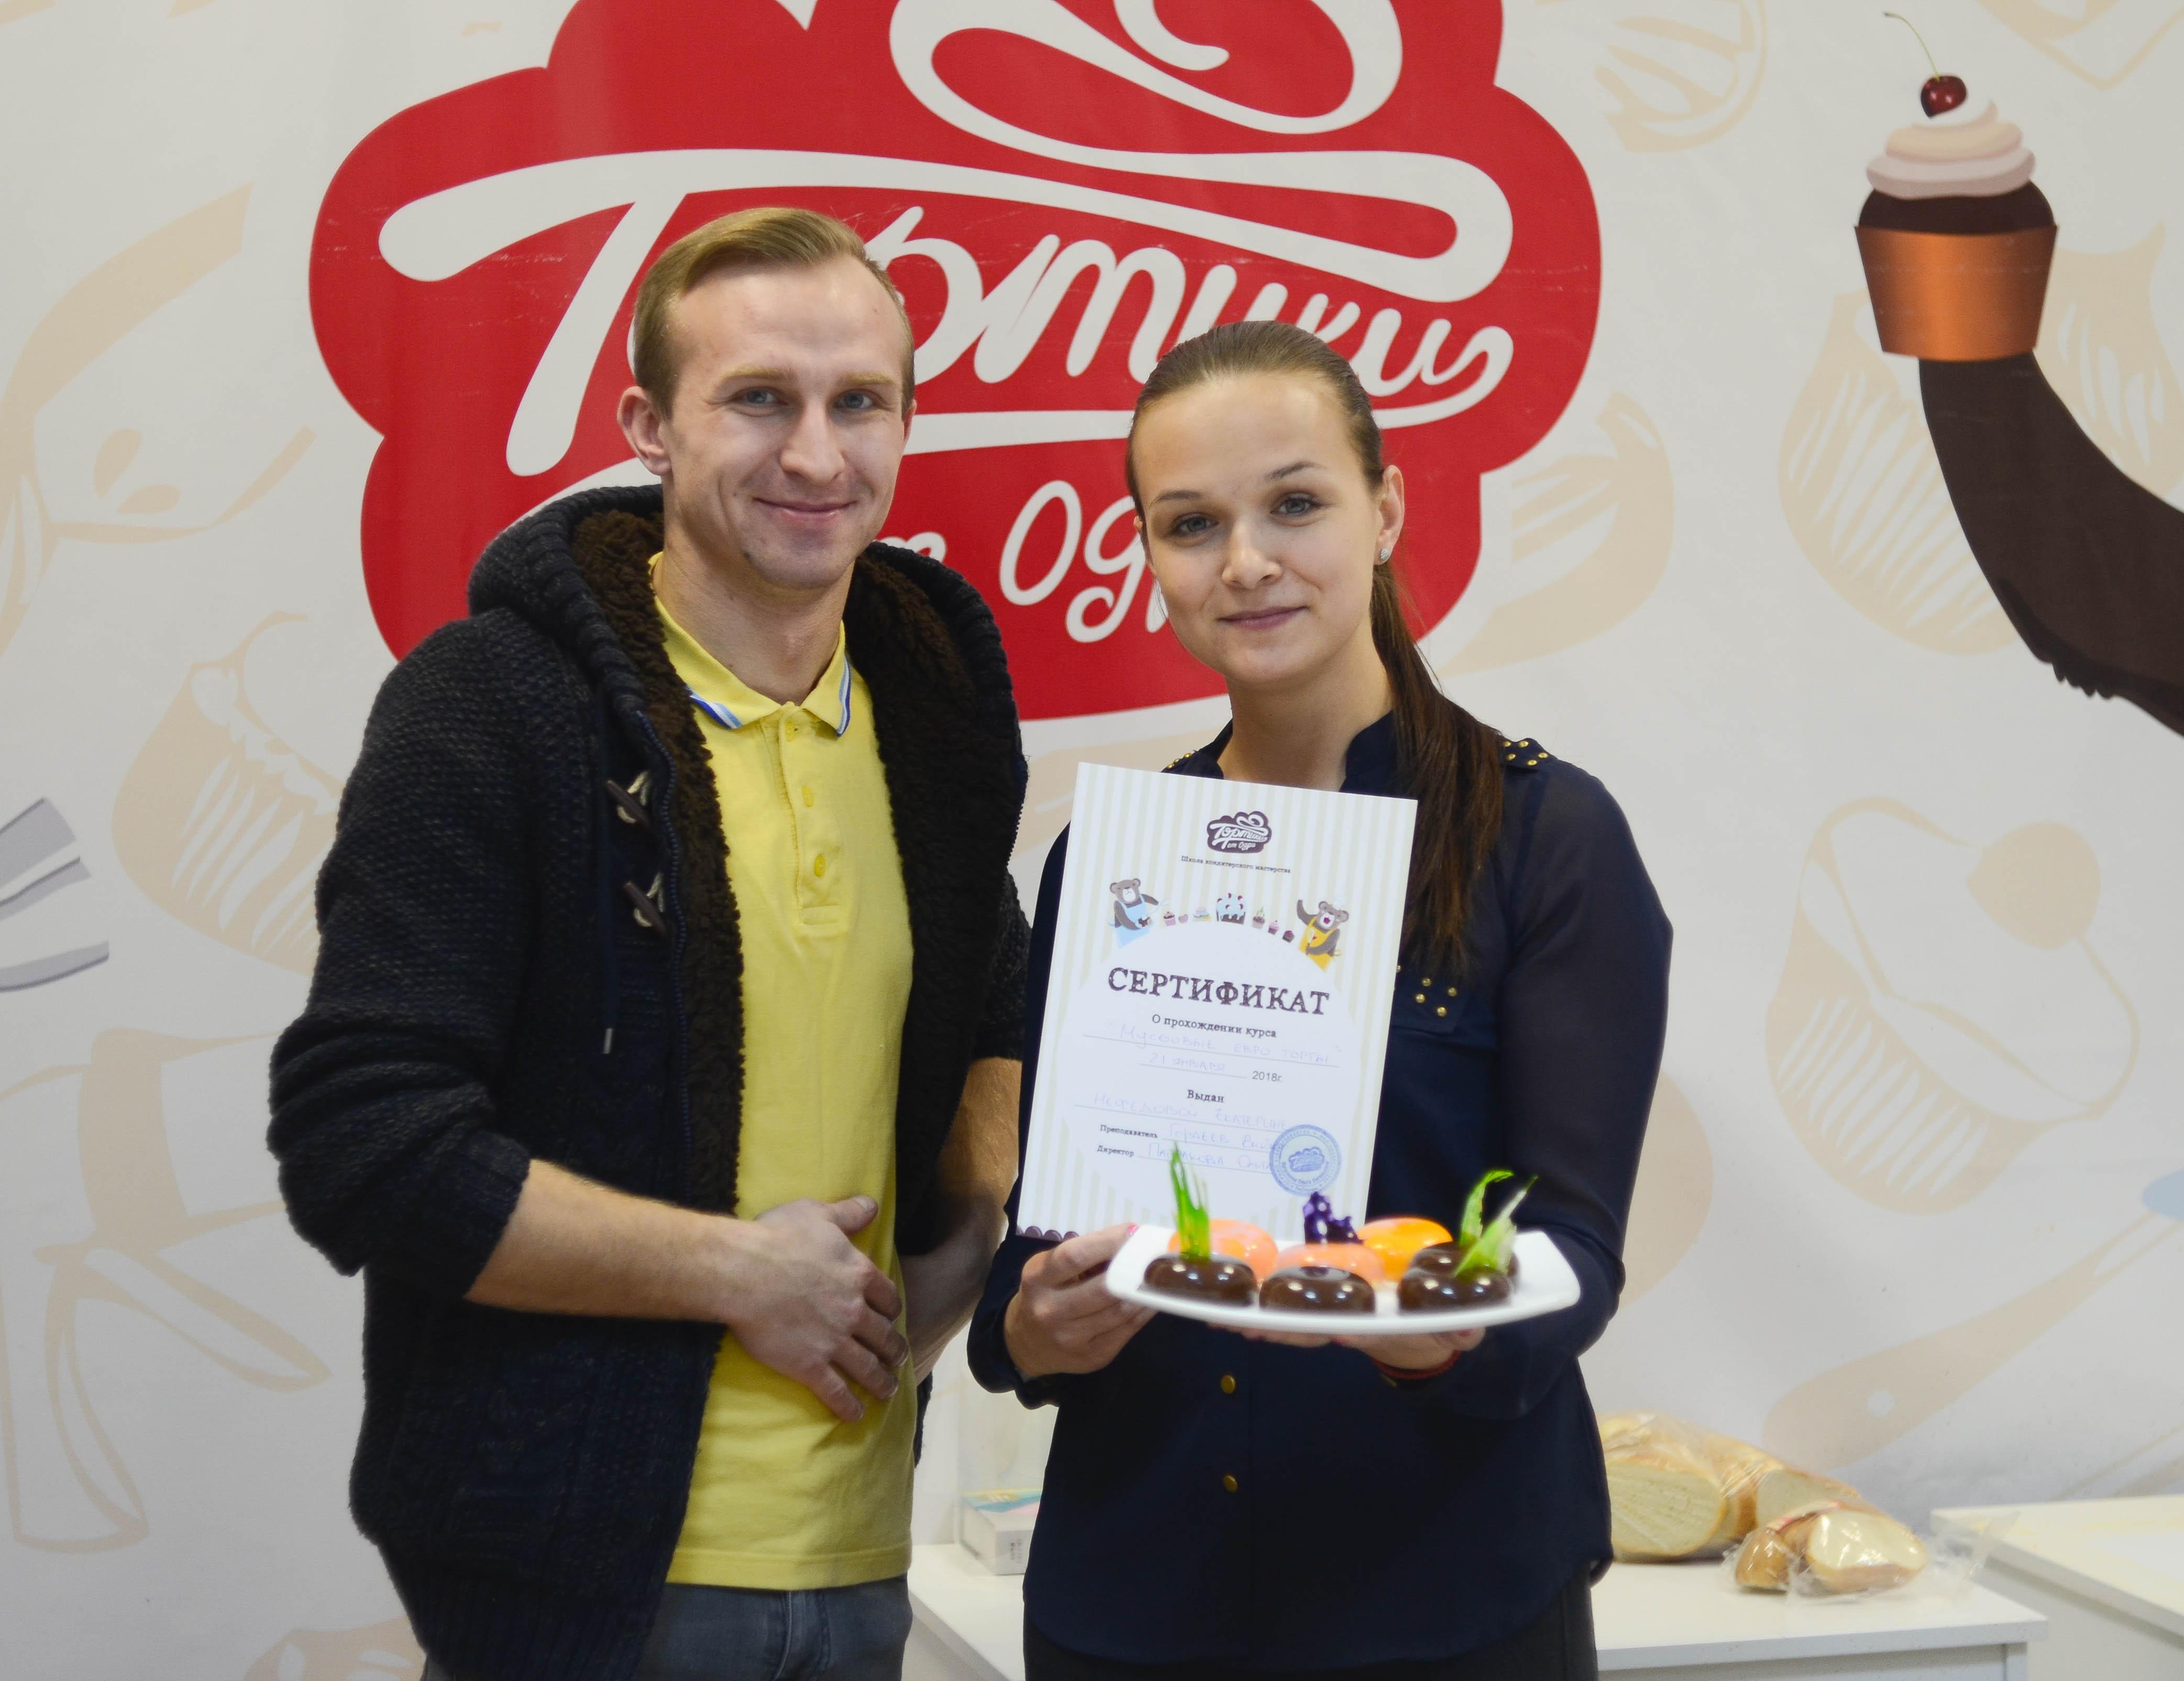 http://odry-school.ru/images/upload/DSC_0177.jpg